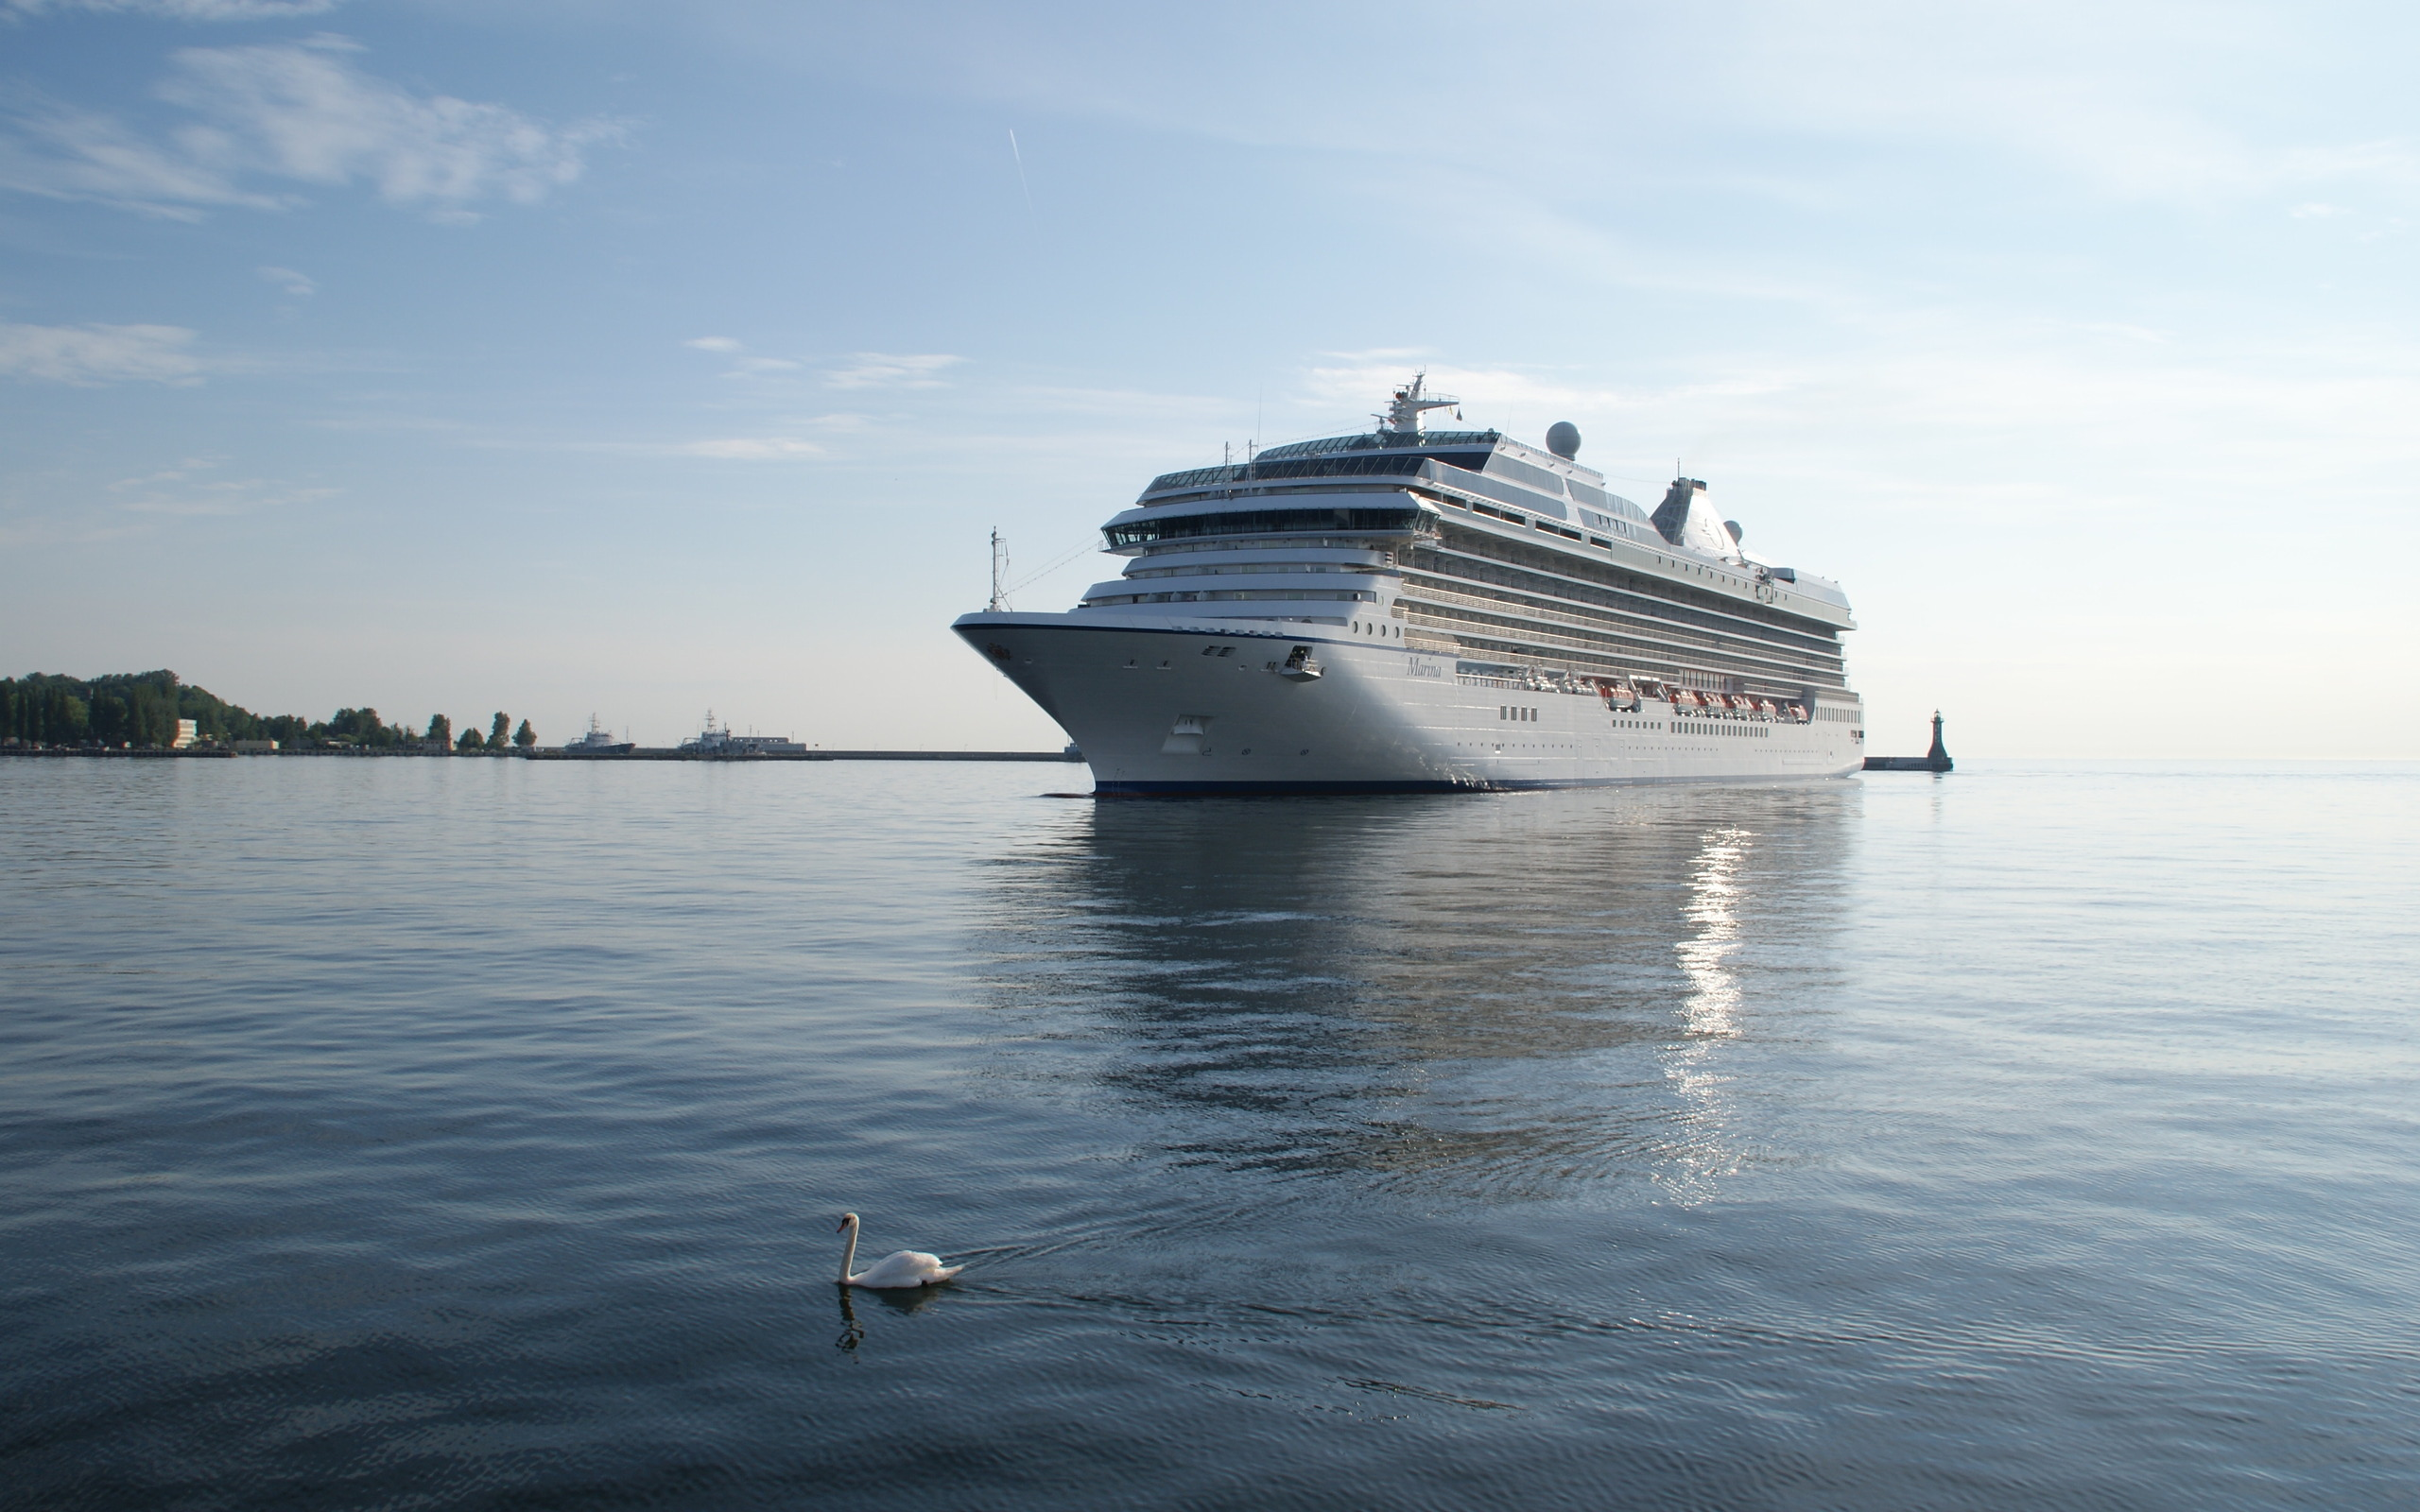 cruise ship wallpaper background - photo #16